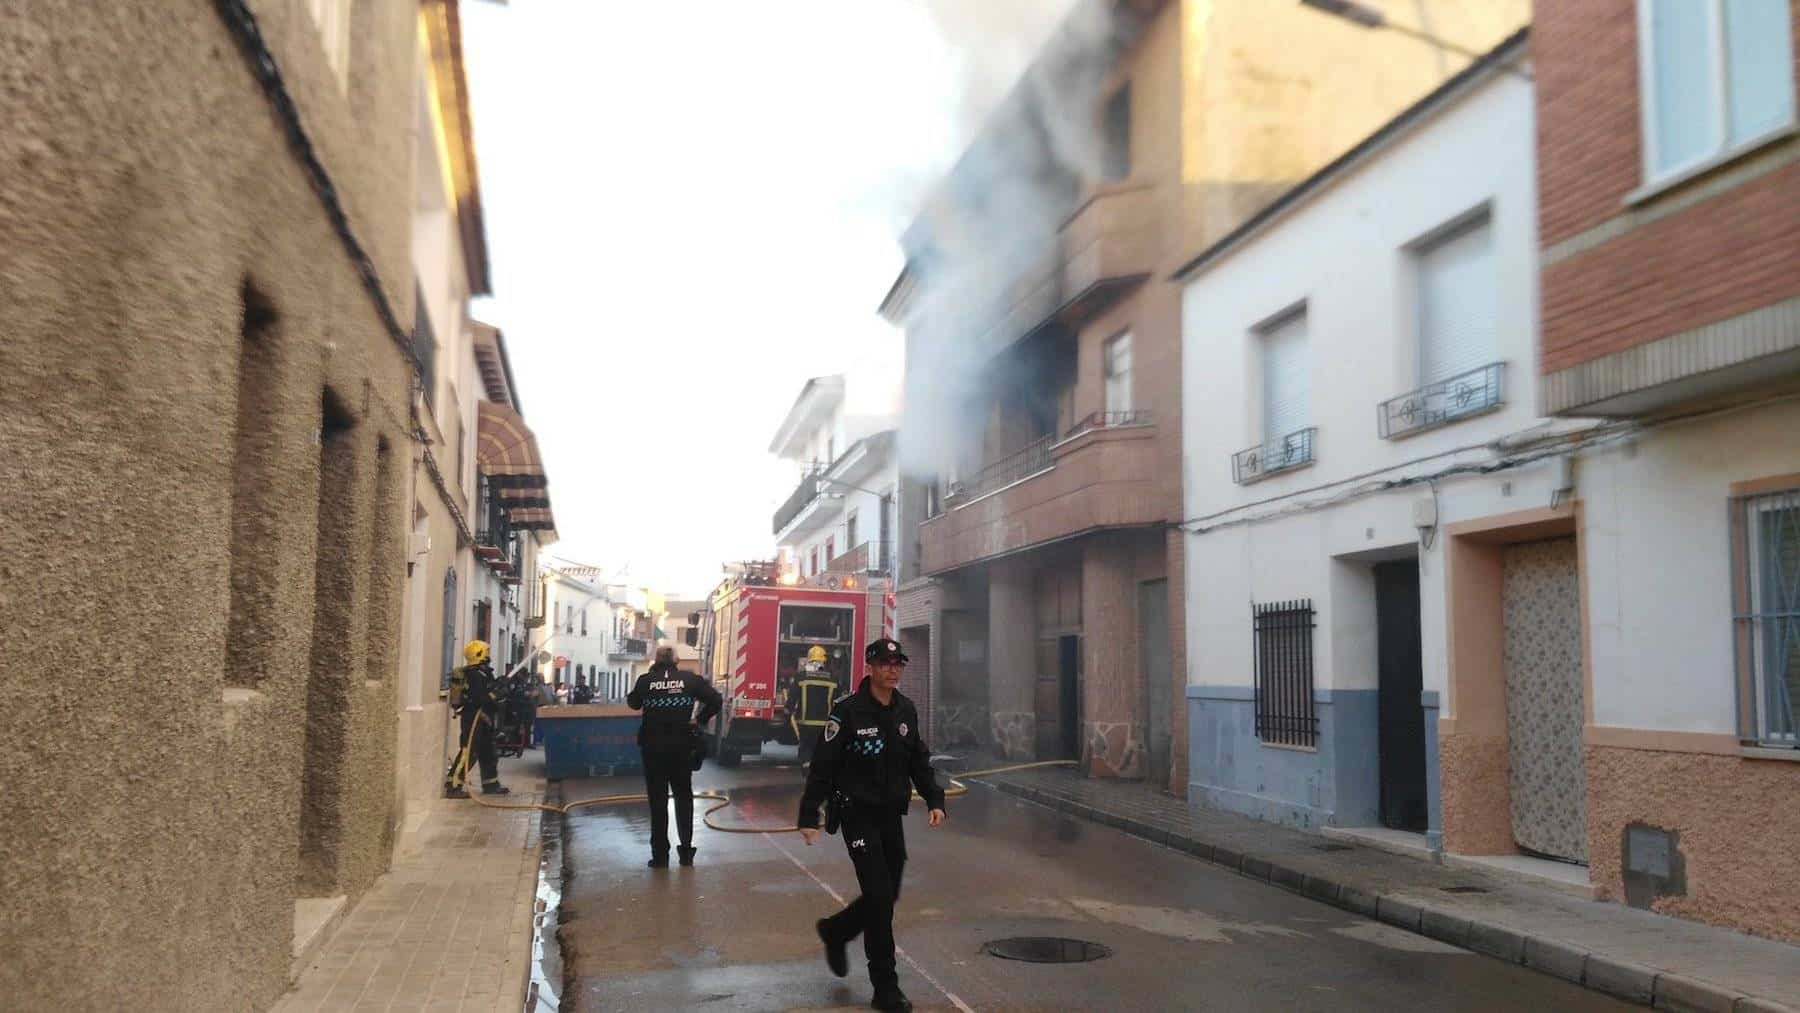 bomberos incendio calle tahona herencia 2 - Declarado un incendio en la Calle Tahona de Herencia